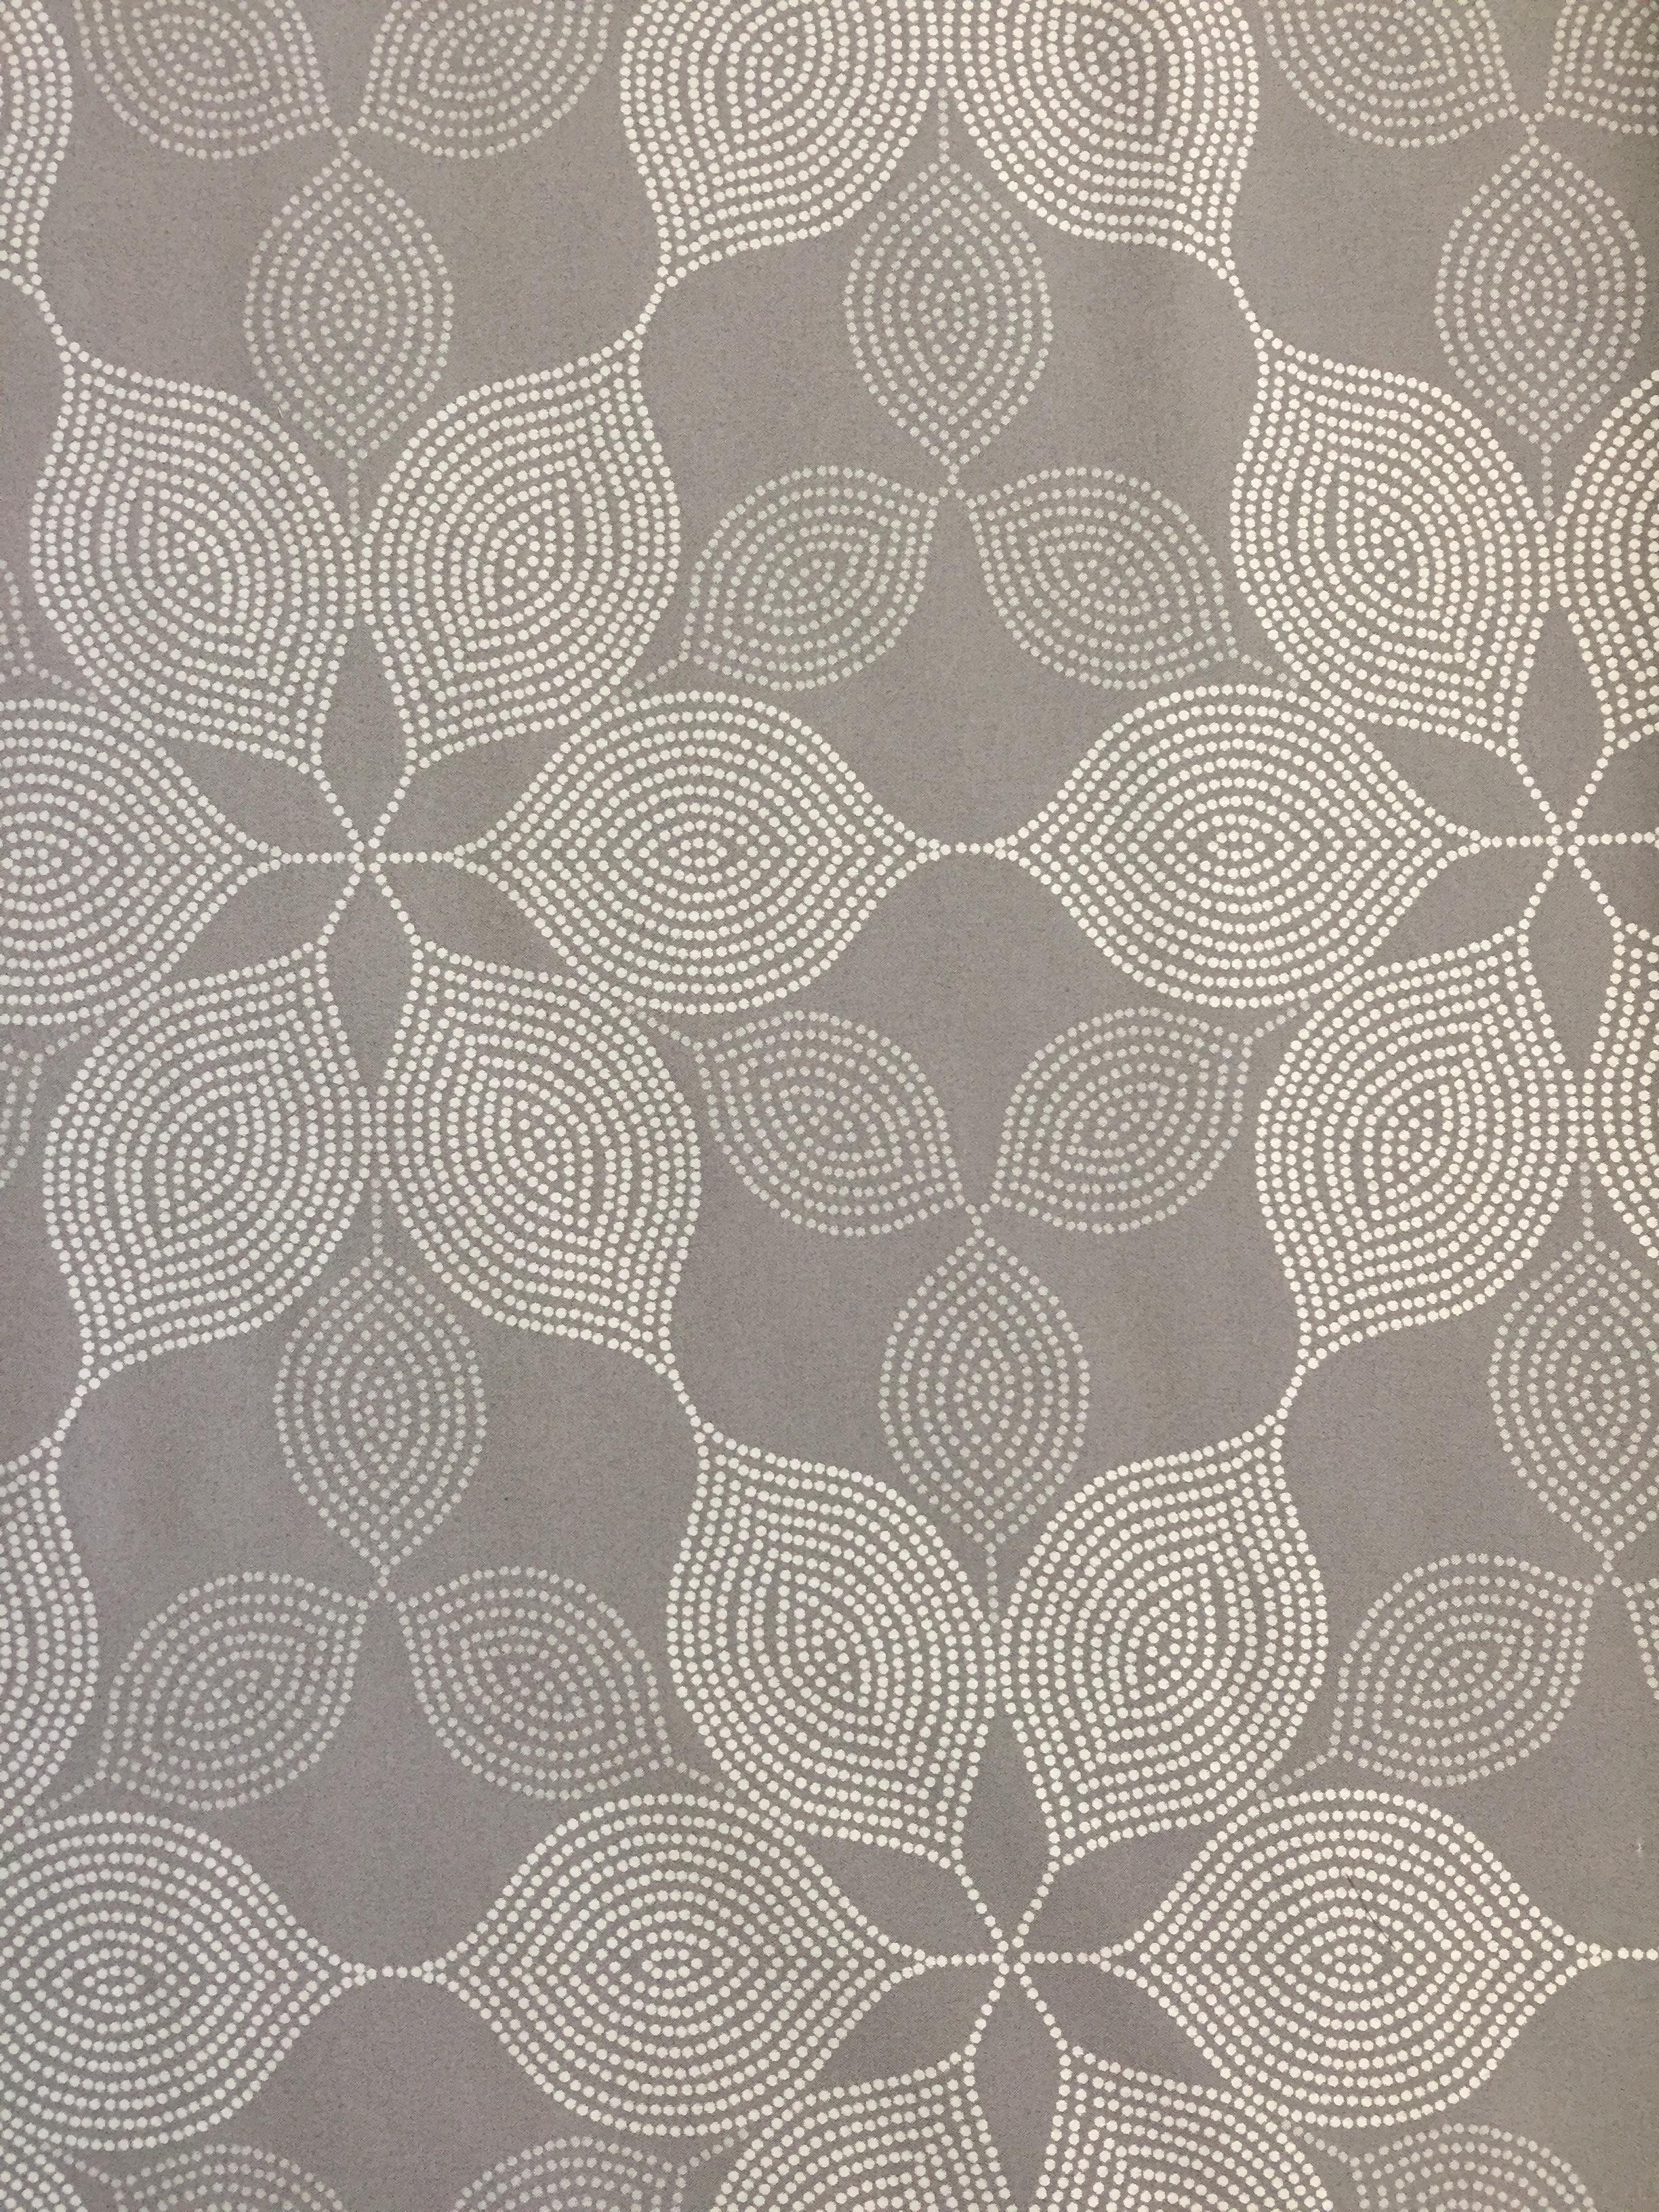 Compose Fabric Select Print Fabrics Ar Nelson